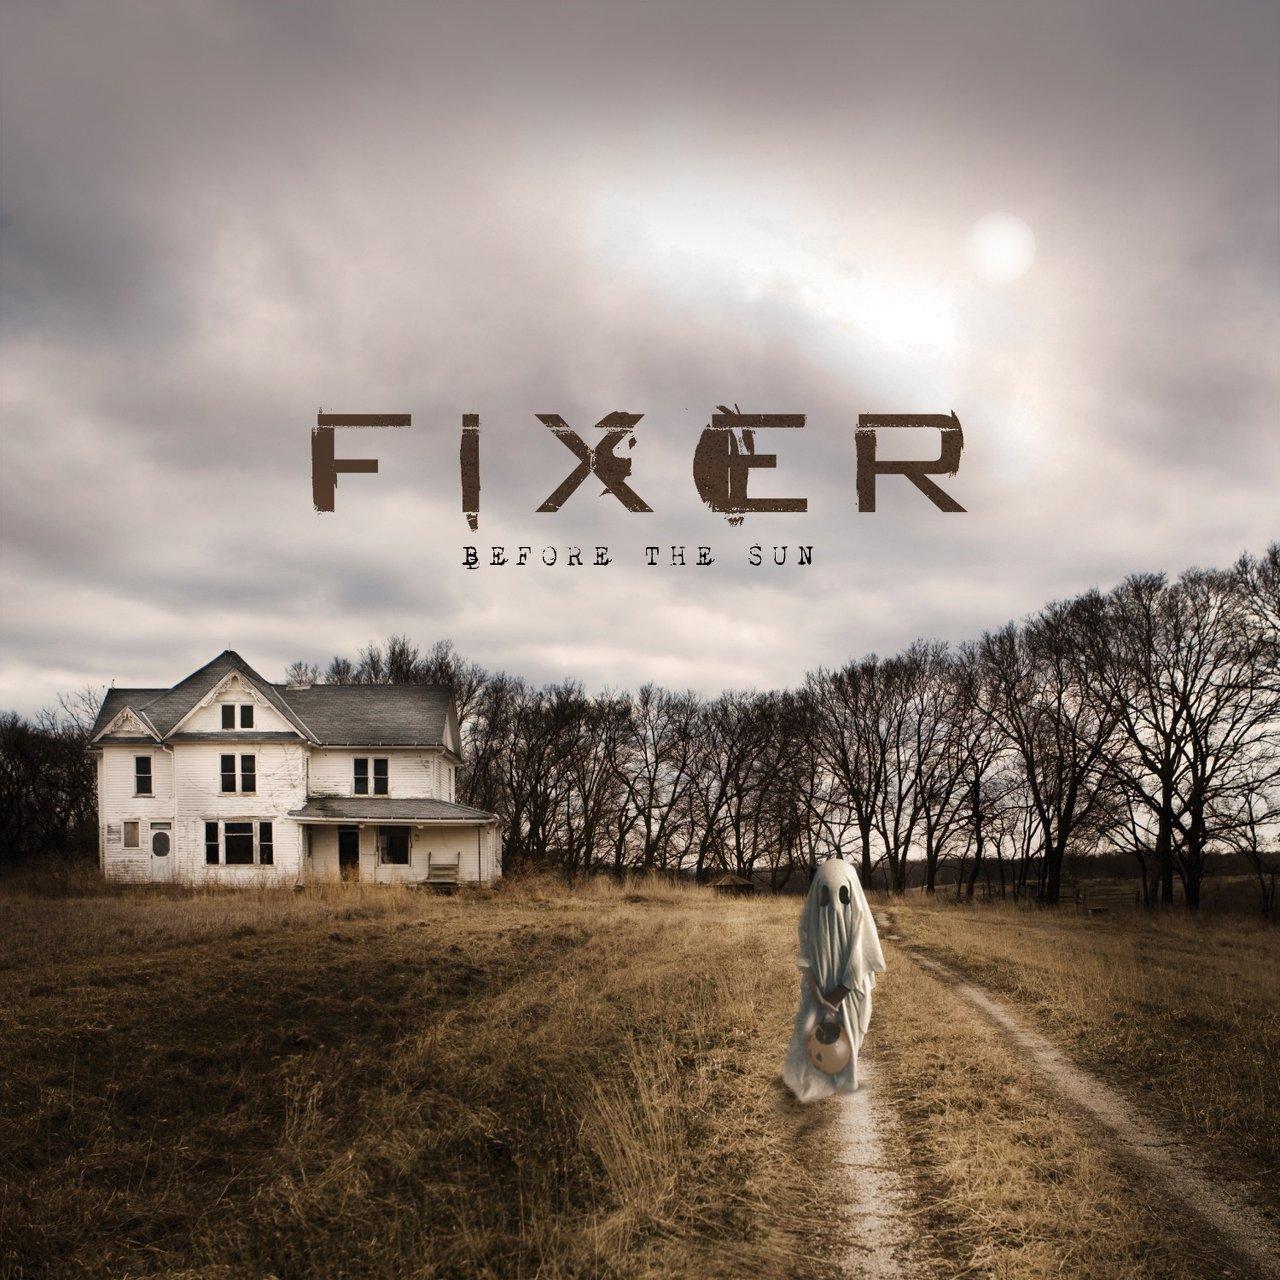 Fixer - Before The Sun